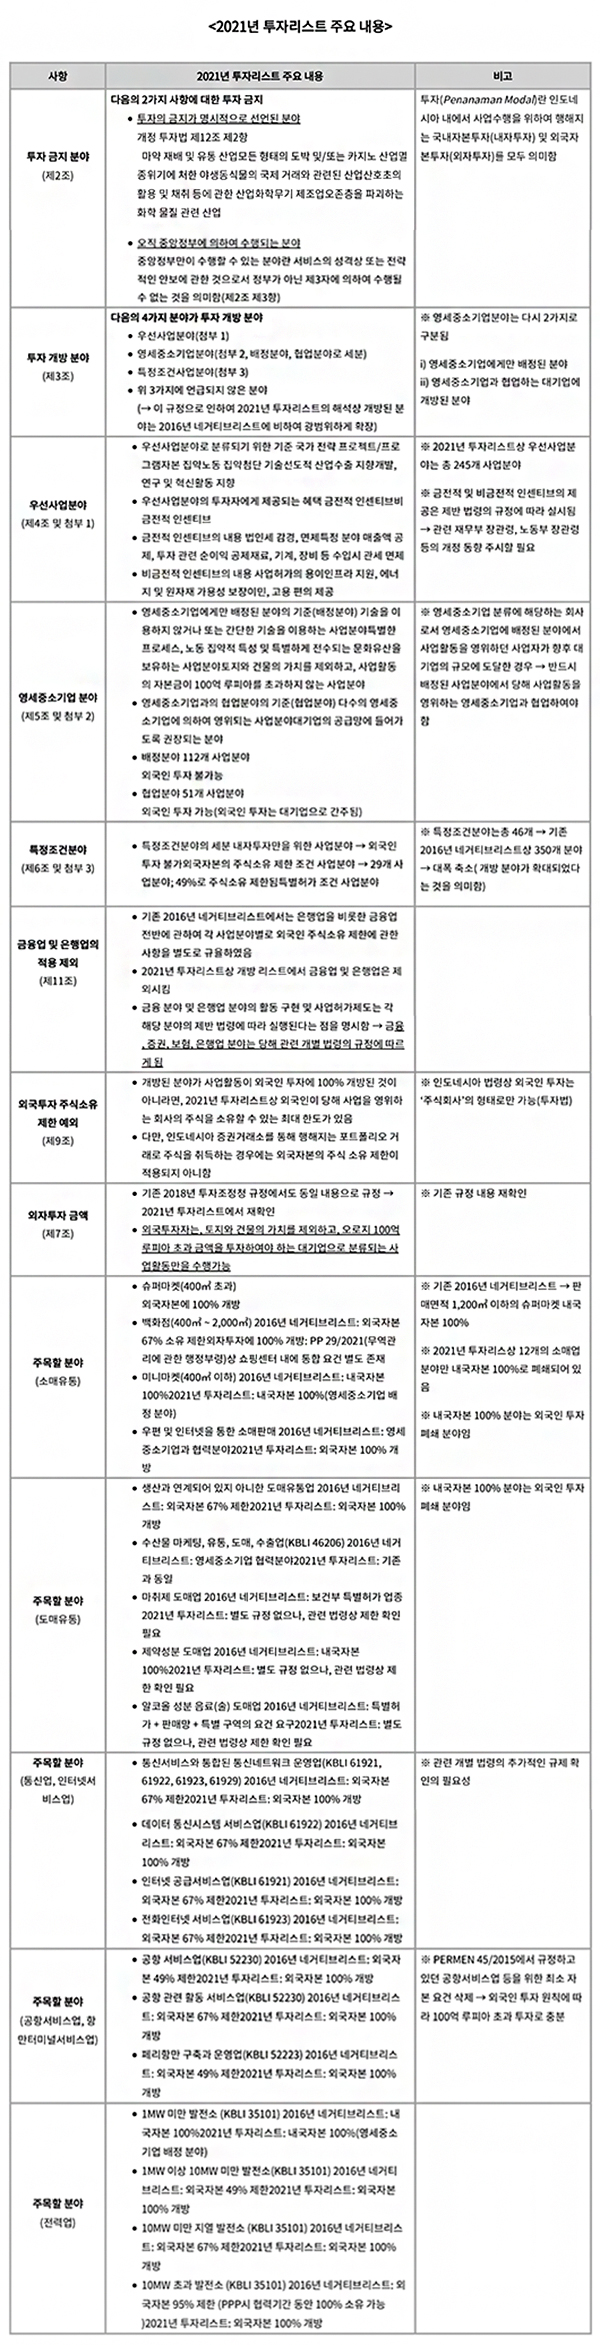 SJ_2021.04.05.jpg